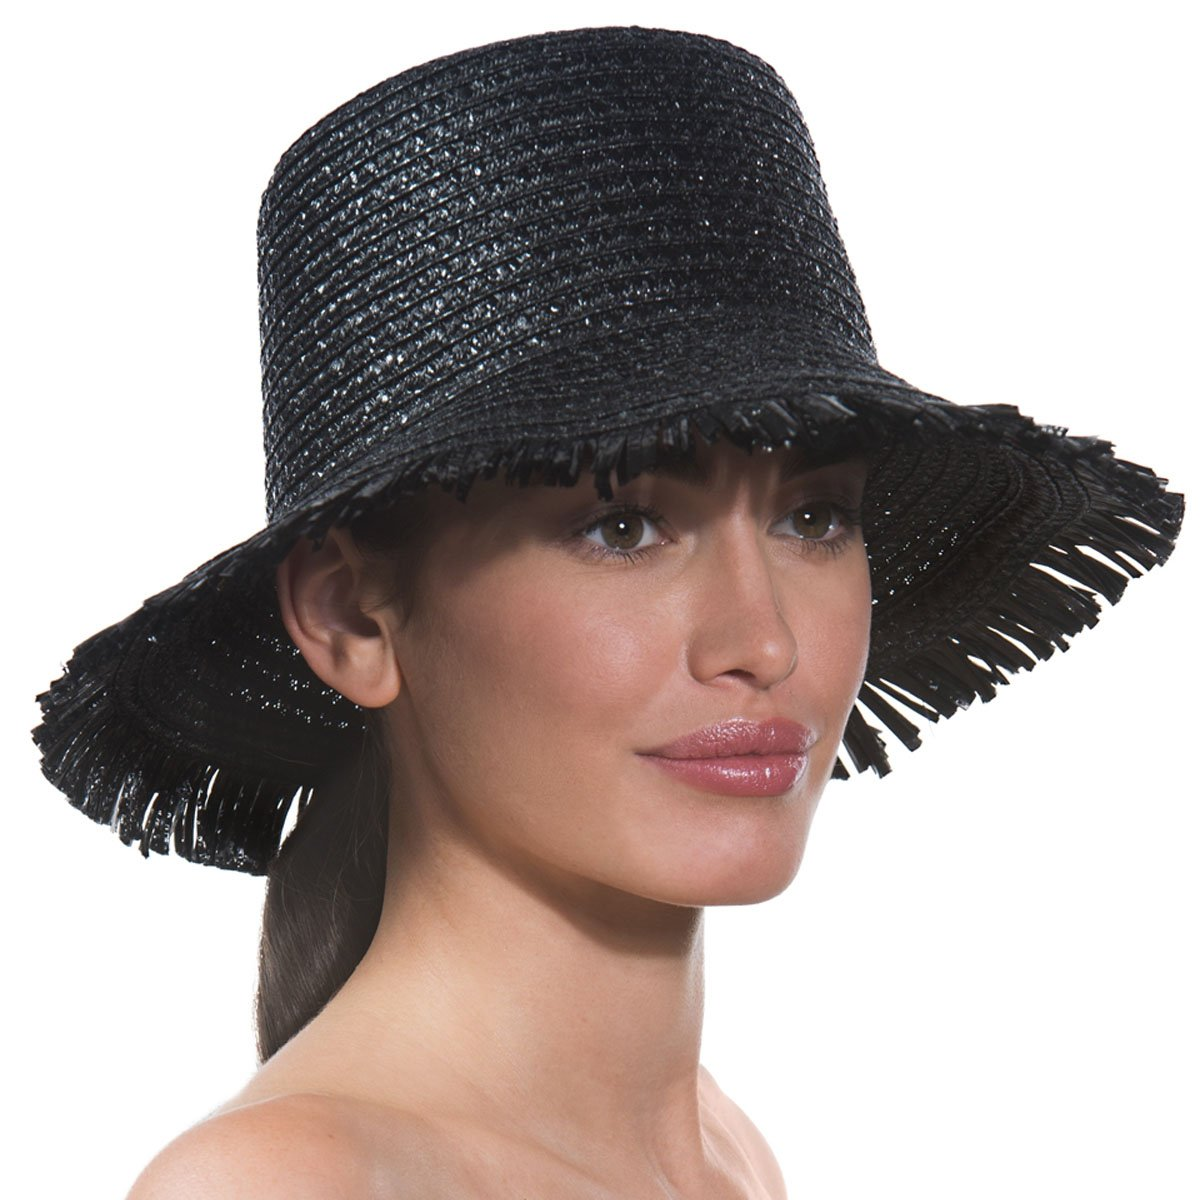 Eric Javits Luxury Fashion Designer Women's Headwear Hat - Tiki Bucket - Black